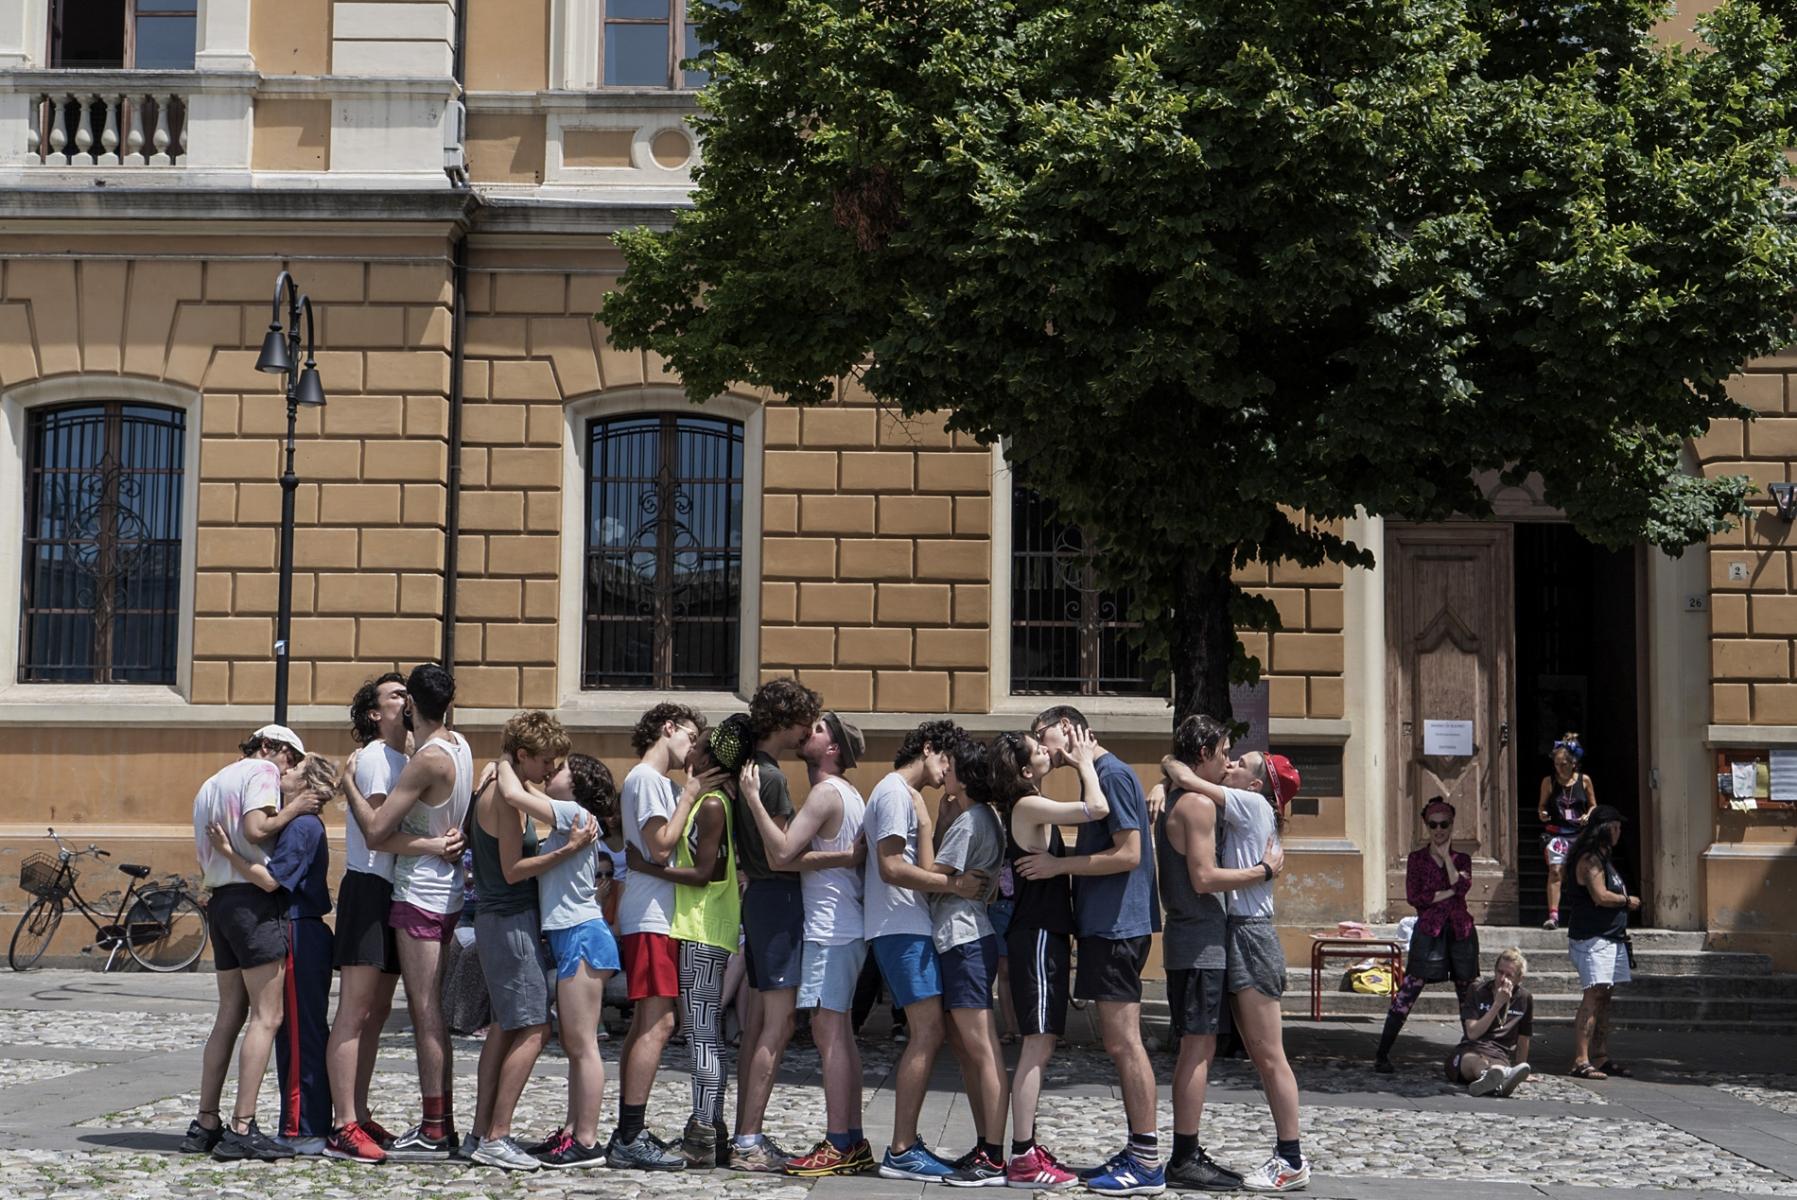 Calderoni & Caleo, KISS, Santarcangelo Festival 2019 © Claudia Borgia, Chiara Bruschini